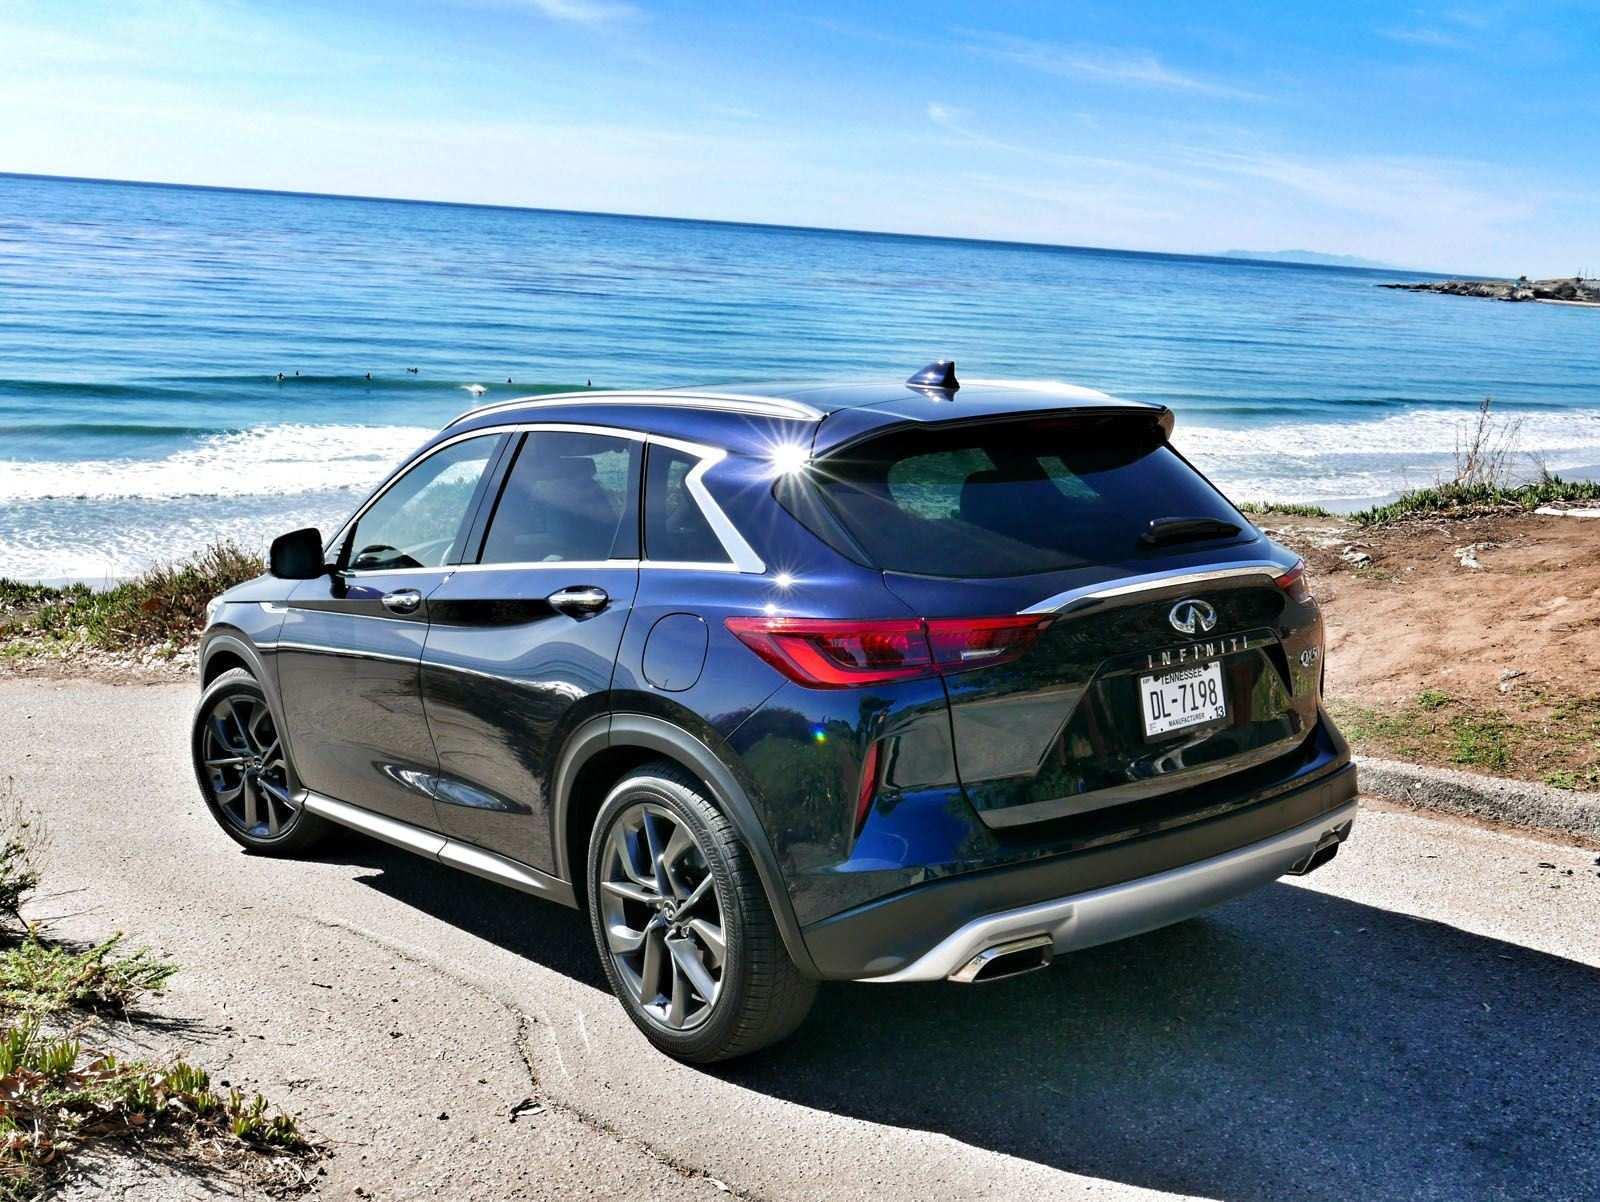 27 Great New 2019 Infiniti Qx50 Fuel Economy Review Model by New 2019 Infiniti Qx50 Fuel Economy Review